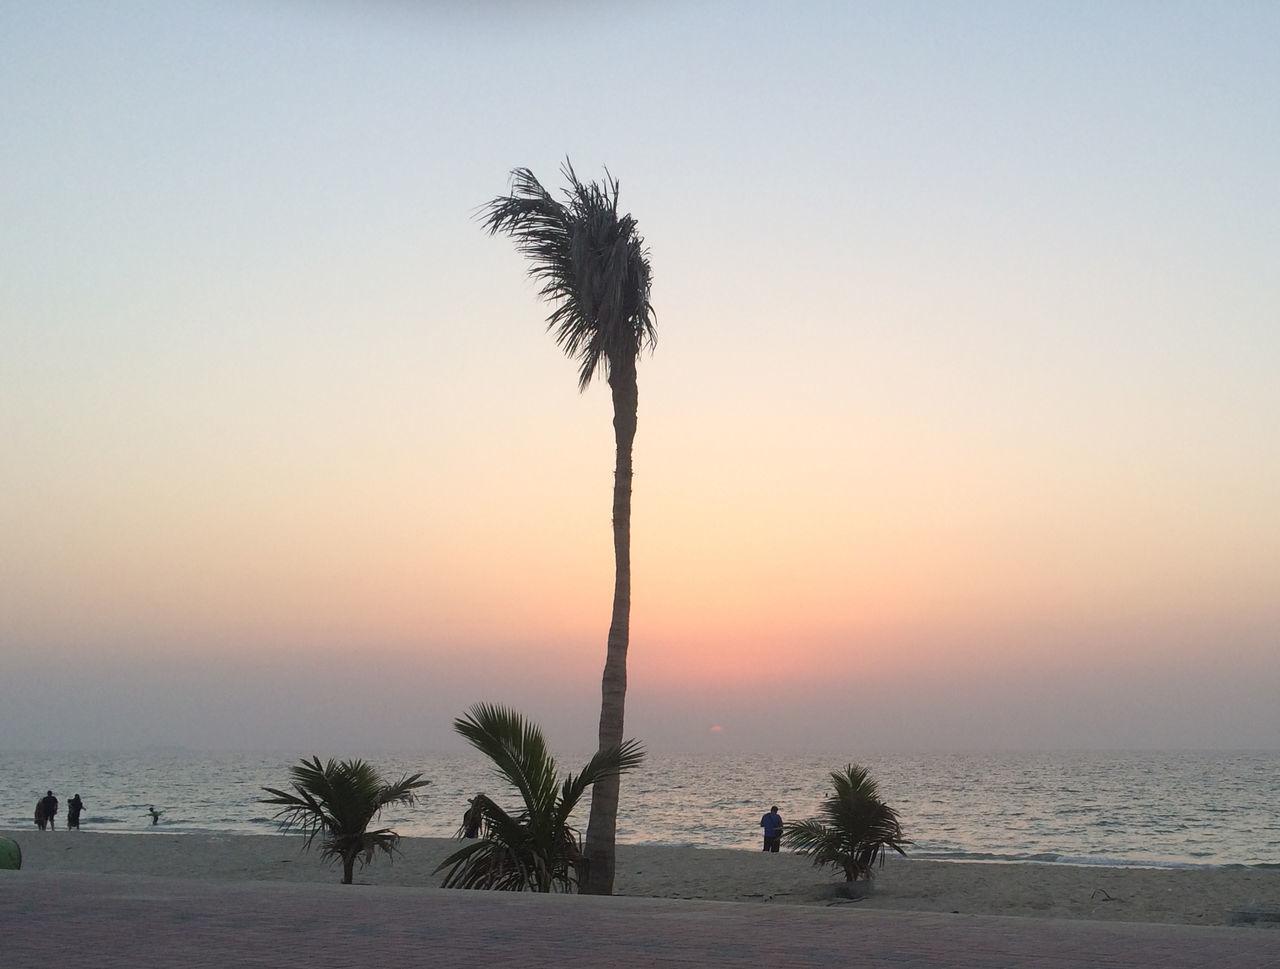 Beach Nature No People Outdoors Palm Tree Sky Sunset Tree The Great Outdoors - 2017 EyeEm Awards